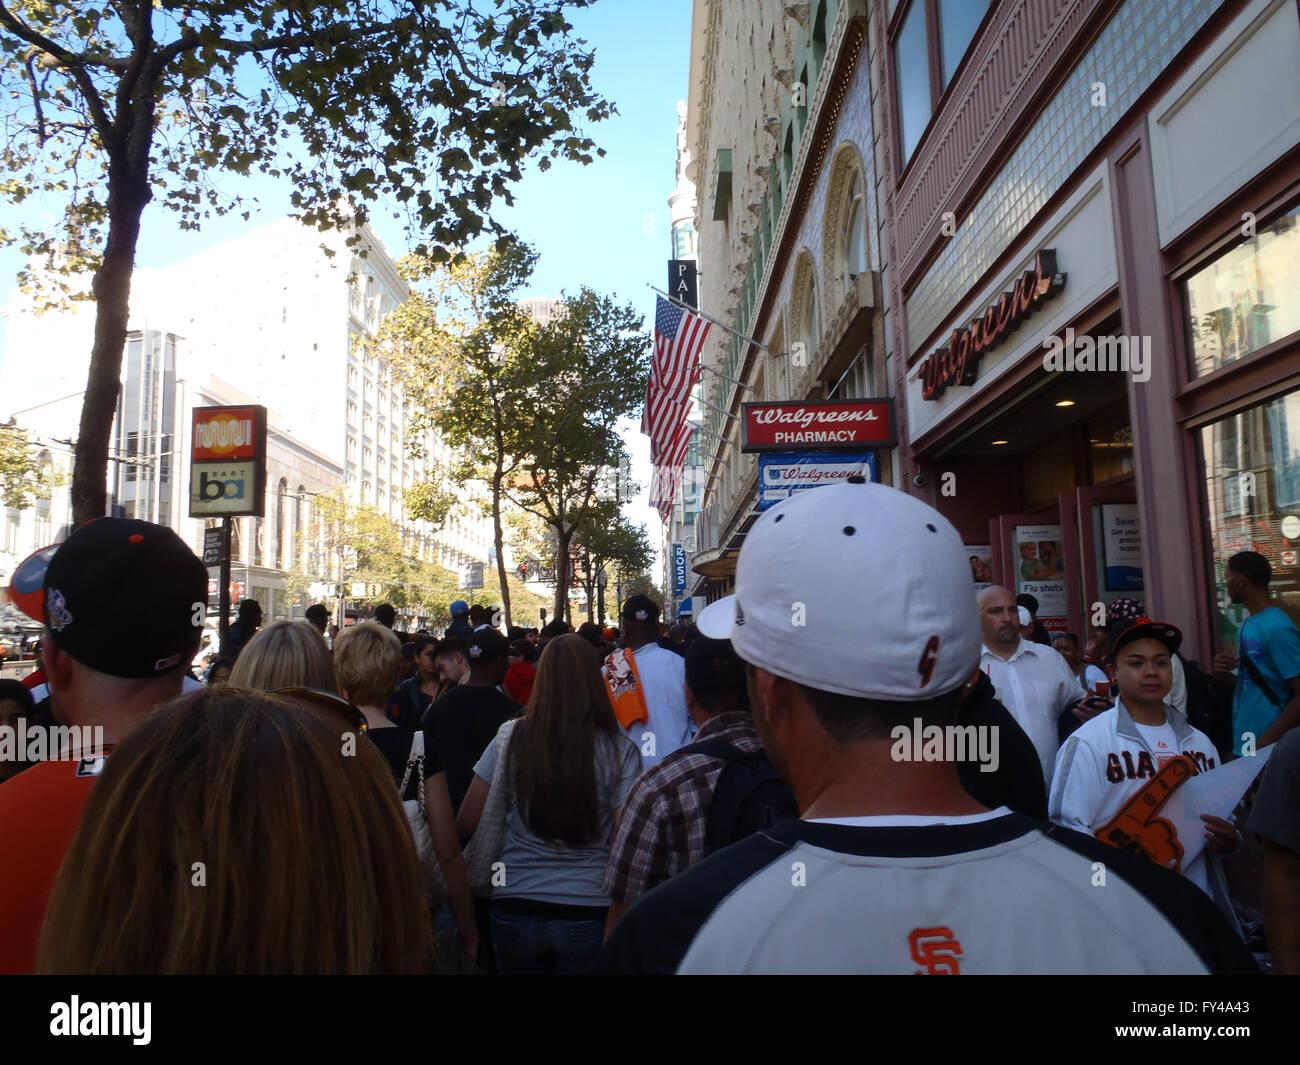 SAN FRANCISCO, CA - NOVEMBER 3: Crowd of Giants fans walk down Market Street by Walgreens, and Muni BART Station - Stock Image